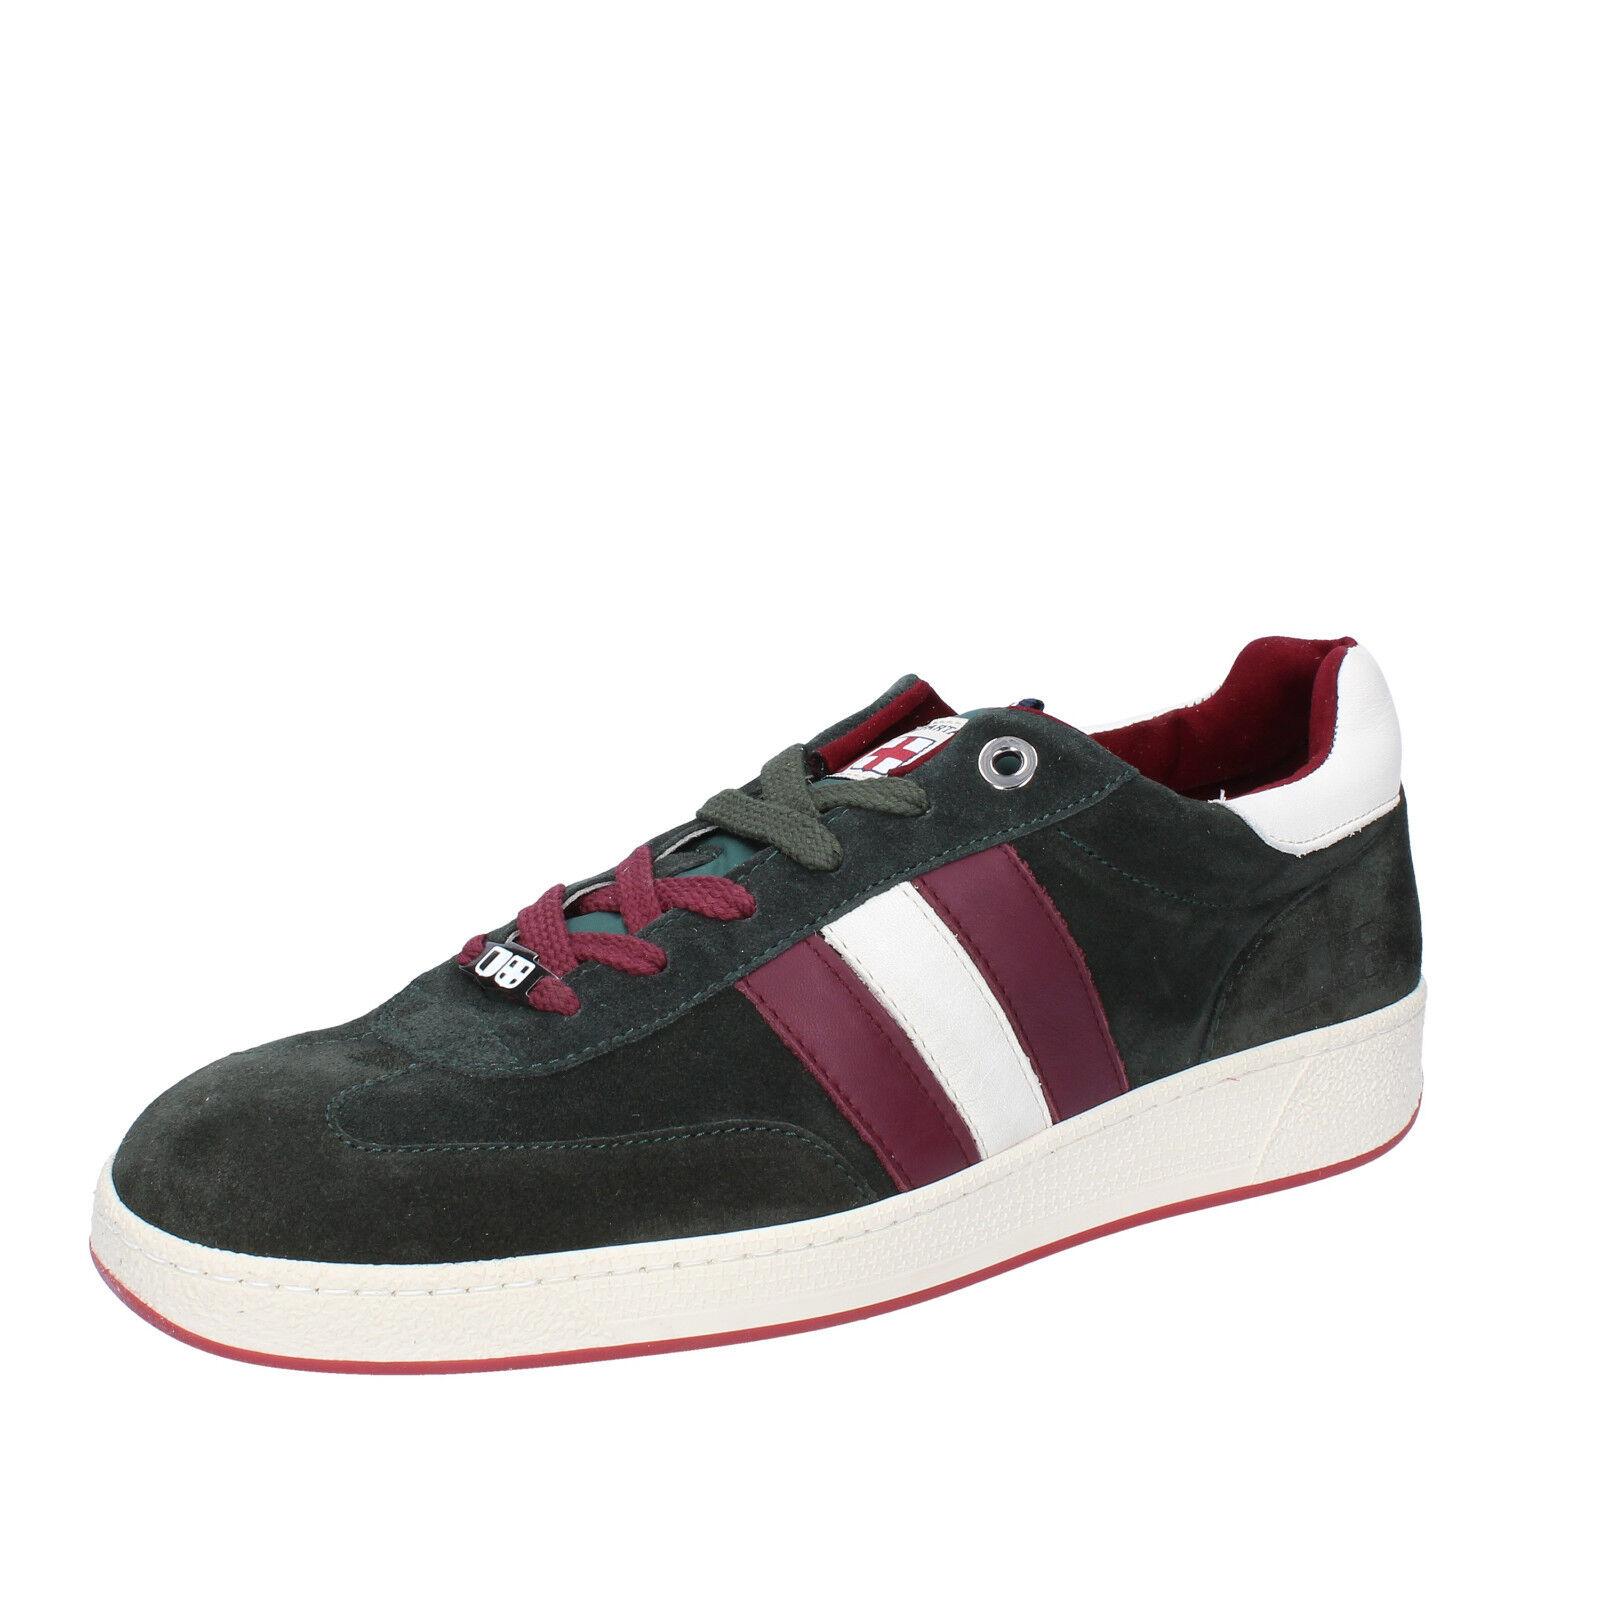 Herren schuhe D' ACQUASPARTA 44 EU sneakers grün wildleder AB870-G